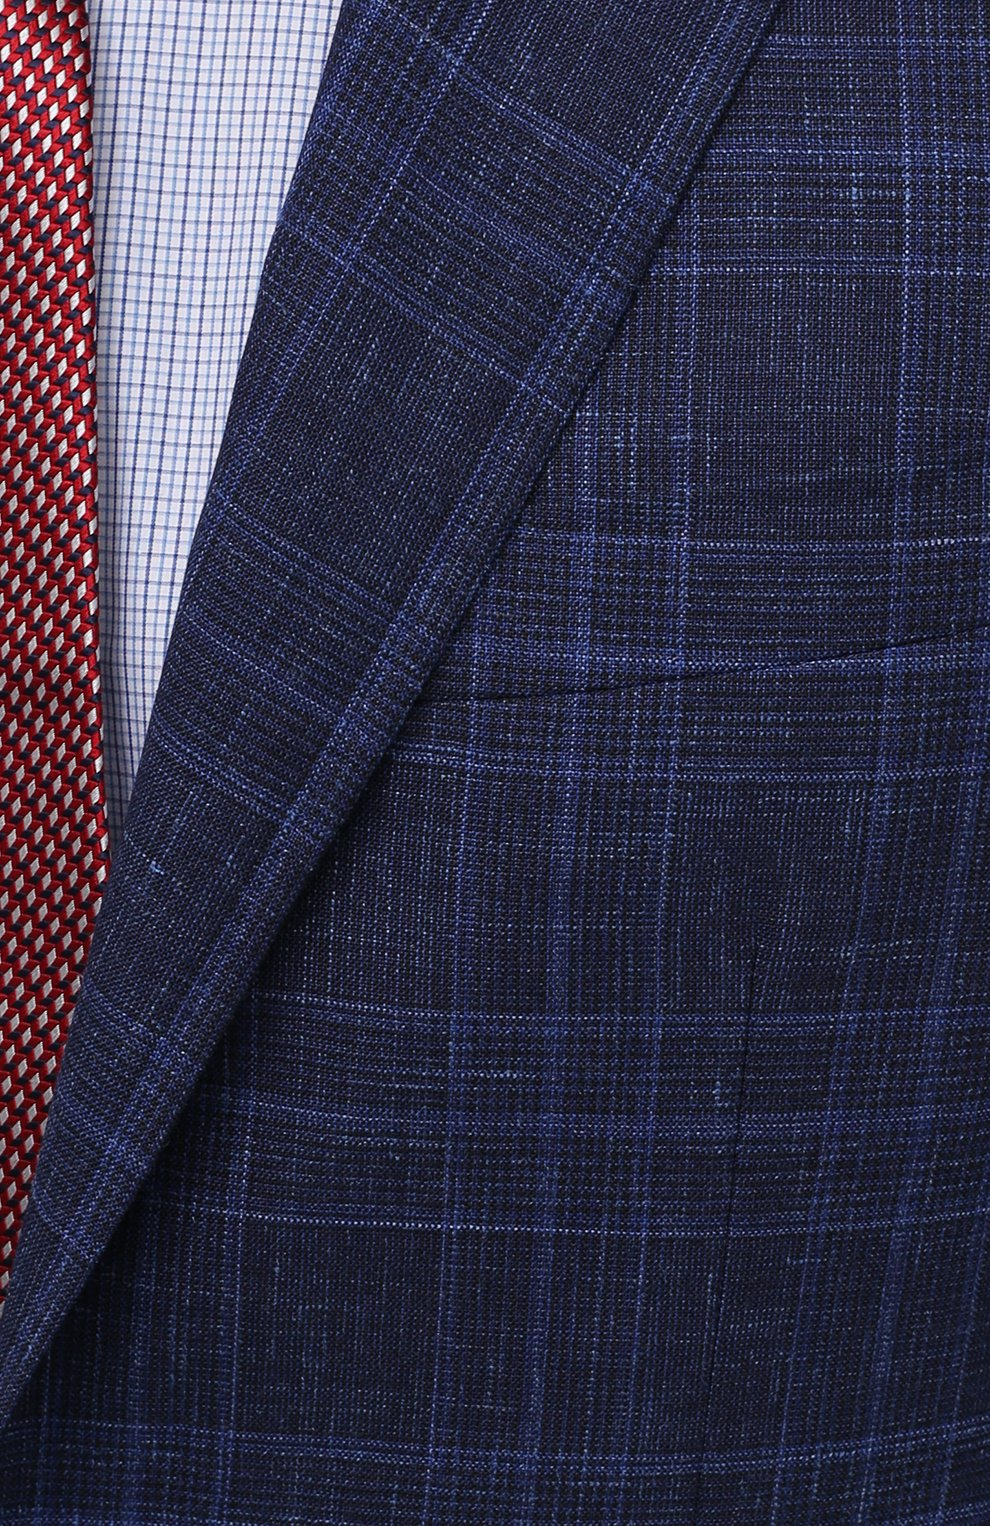 Мужской костюм из шерсти и шелка CANALI темно-синего цвета, арт. 25270/53/BF03199 | Фото 6